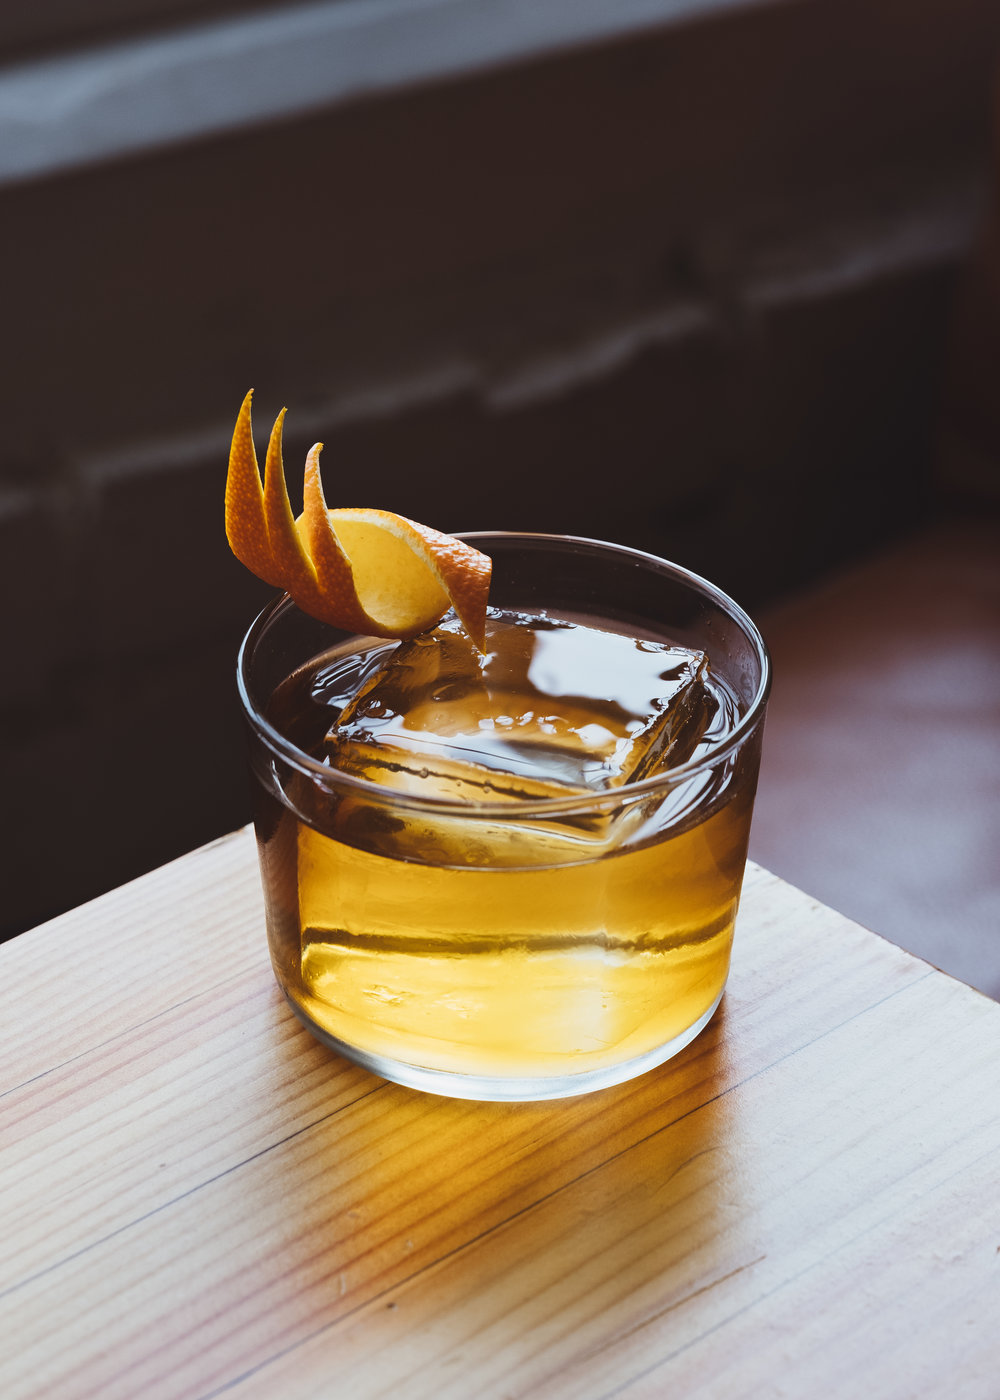 ingredients: - 1 oz Avuá Cachaça Amburana½ oz Drambuie½ oz Townshend's Kashmiri Amaro2 dashes cardamom bitters2 dashes aromatic bitters